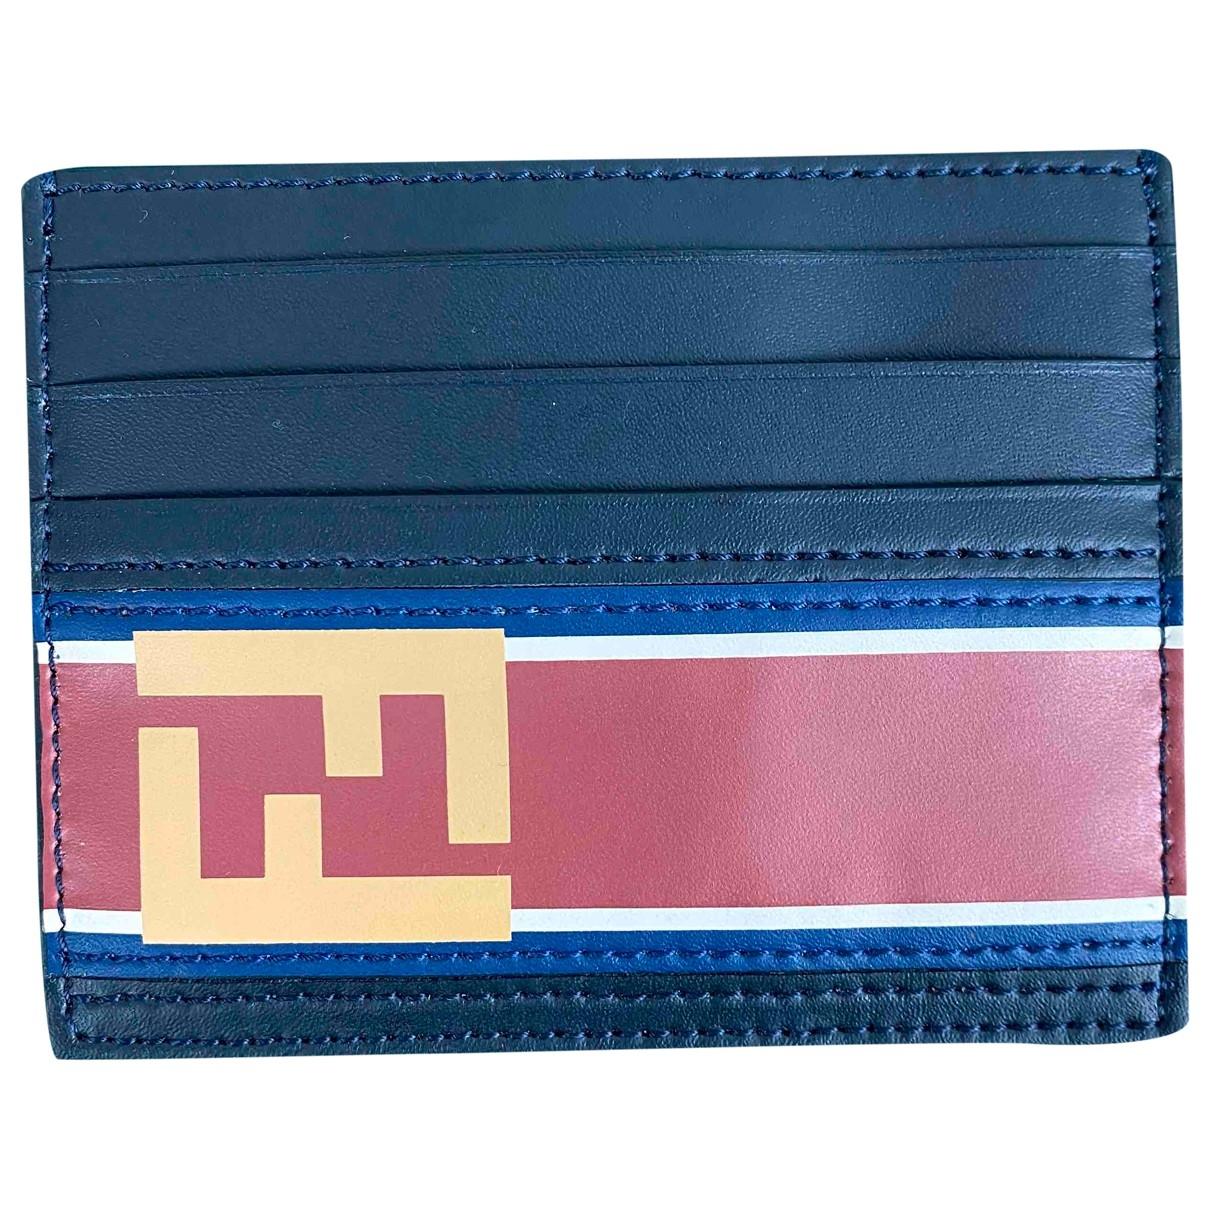 Fendi \N Blue Leather Small bag, wallet & cases for Men \N